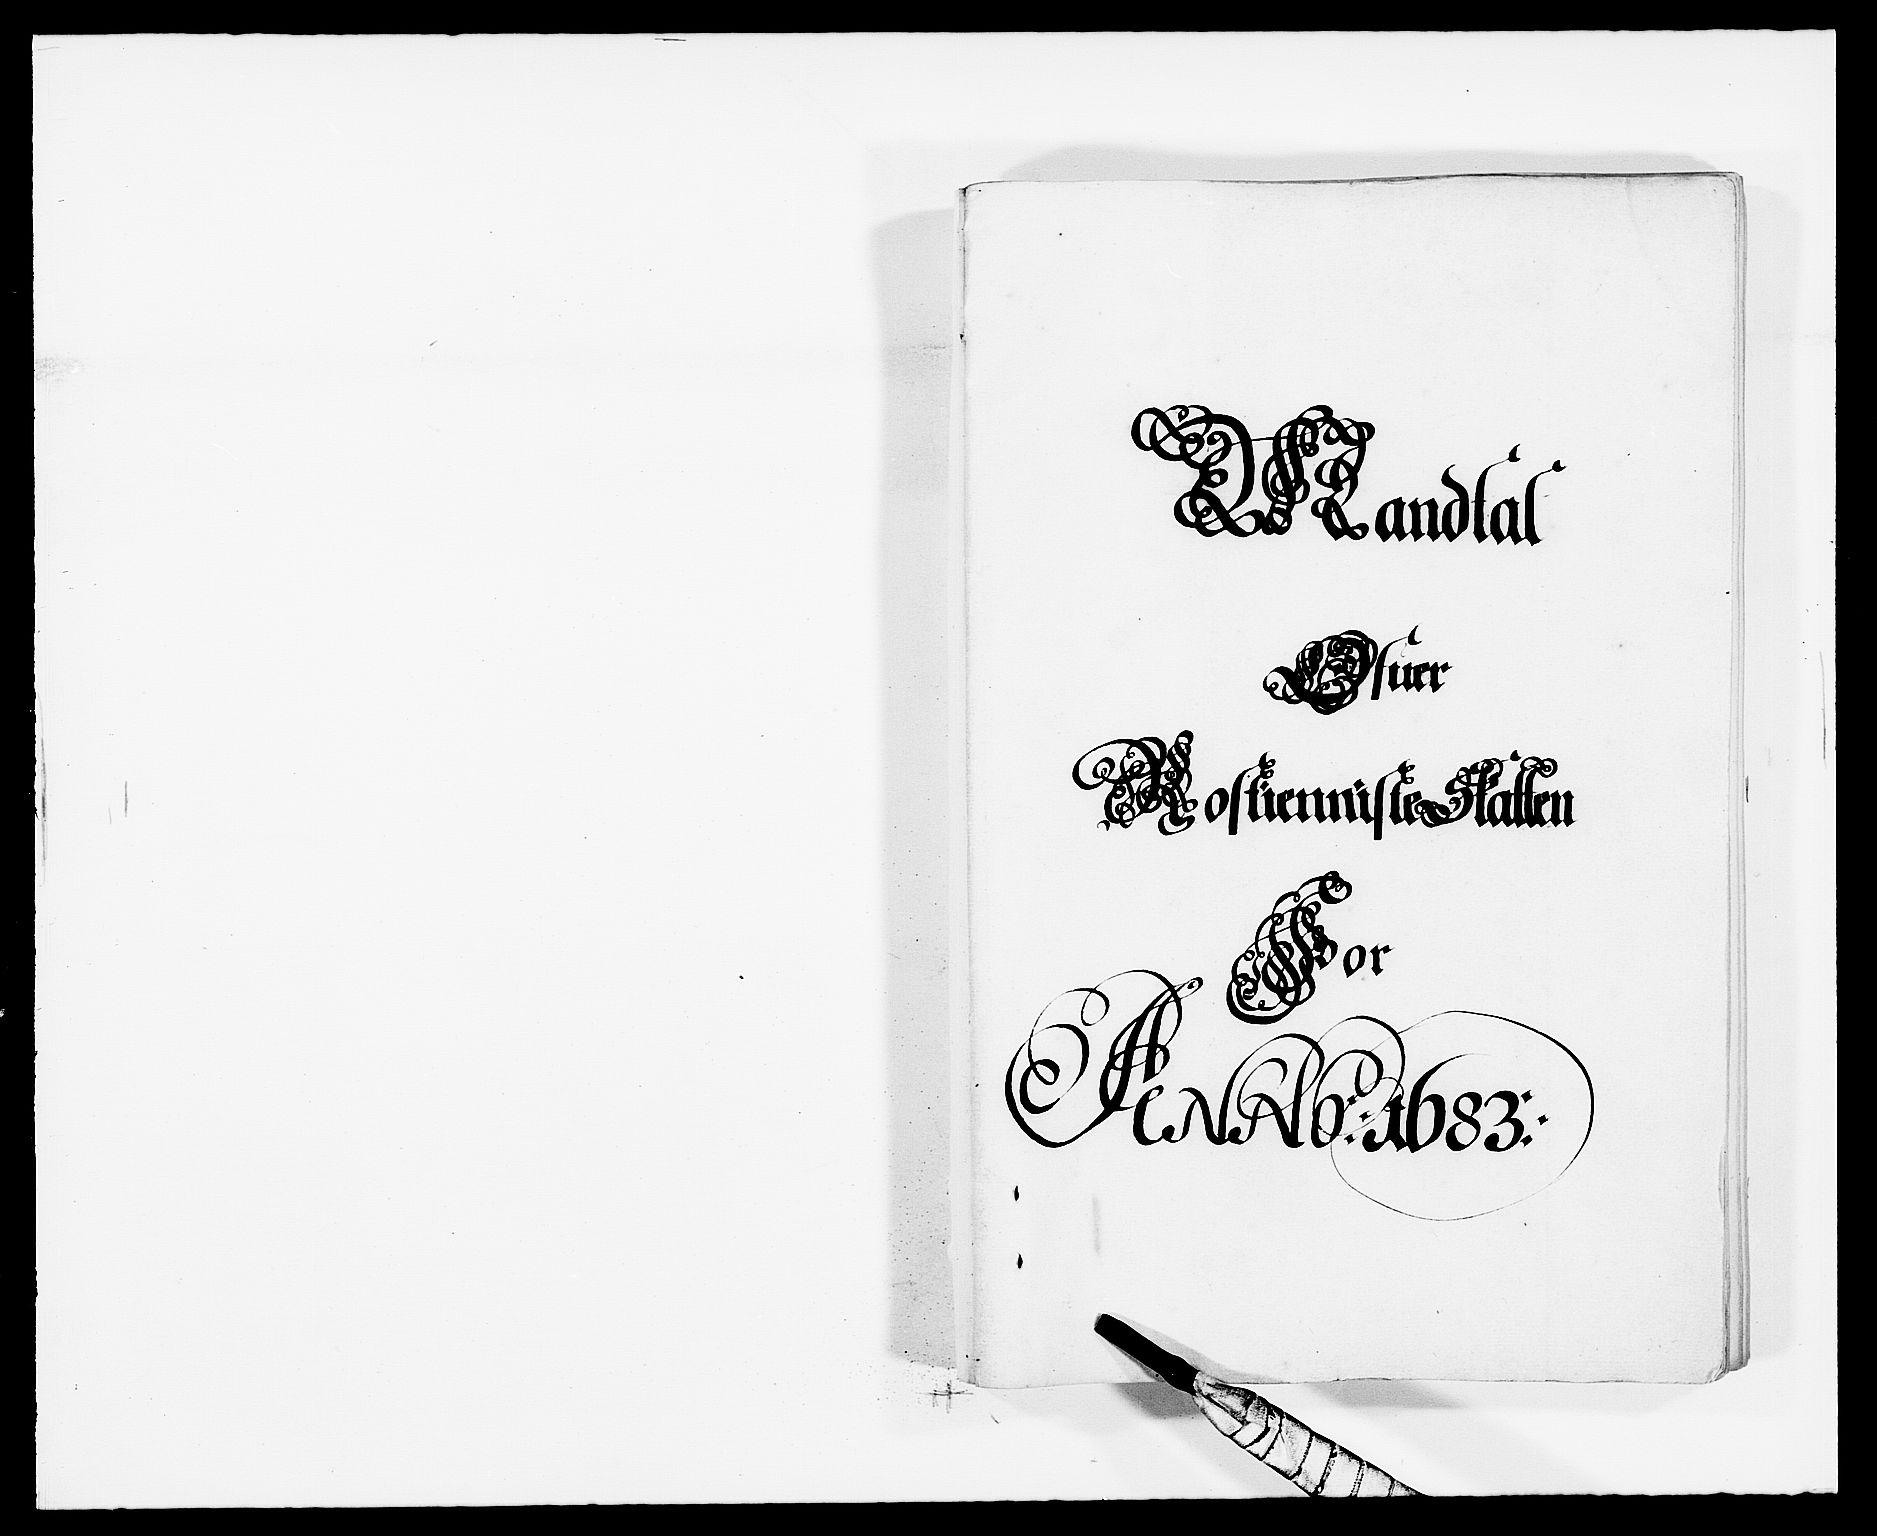 RA, Rentekammeret inntil 1814, Reviderte regnskaper, Fogderegnskap, R32/L1853: Fogderegnskap Jarlsberg grevskap, 1683, s. 6